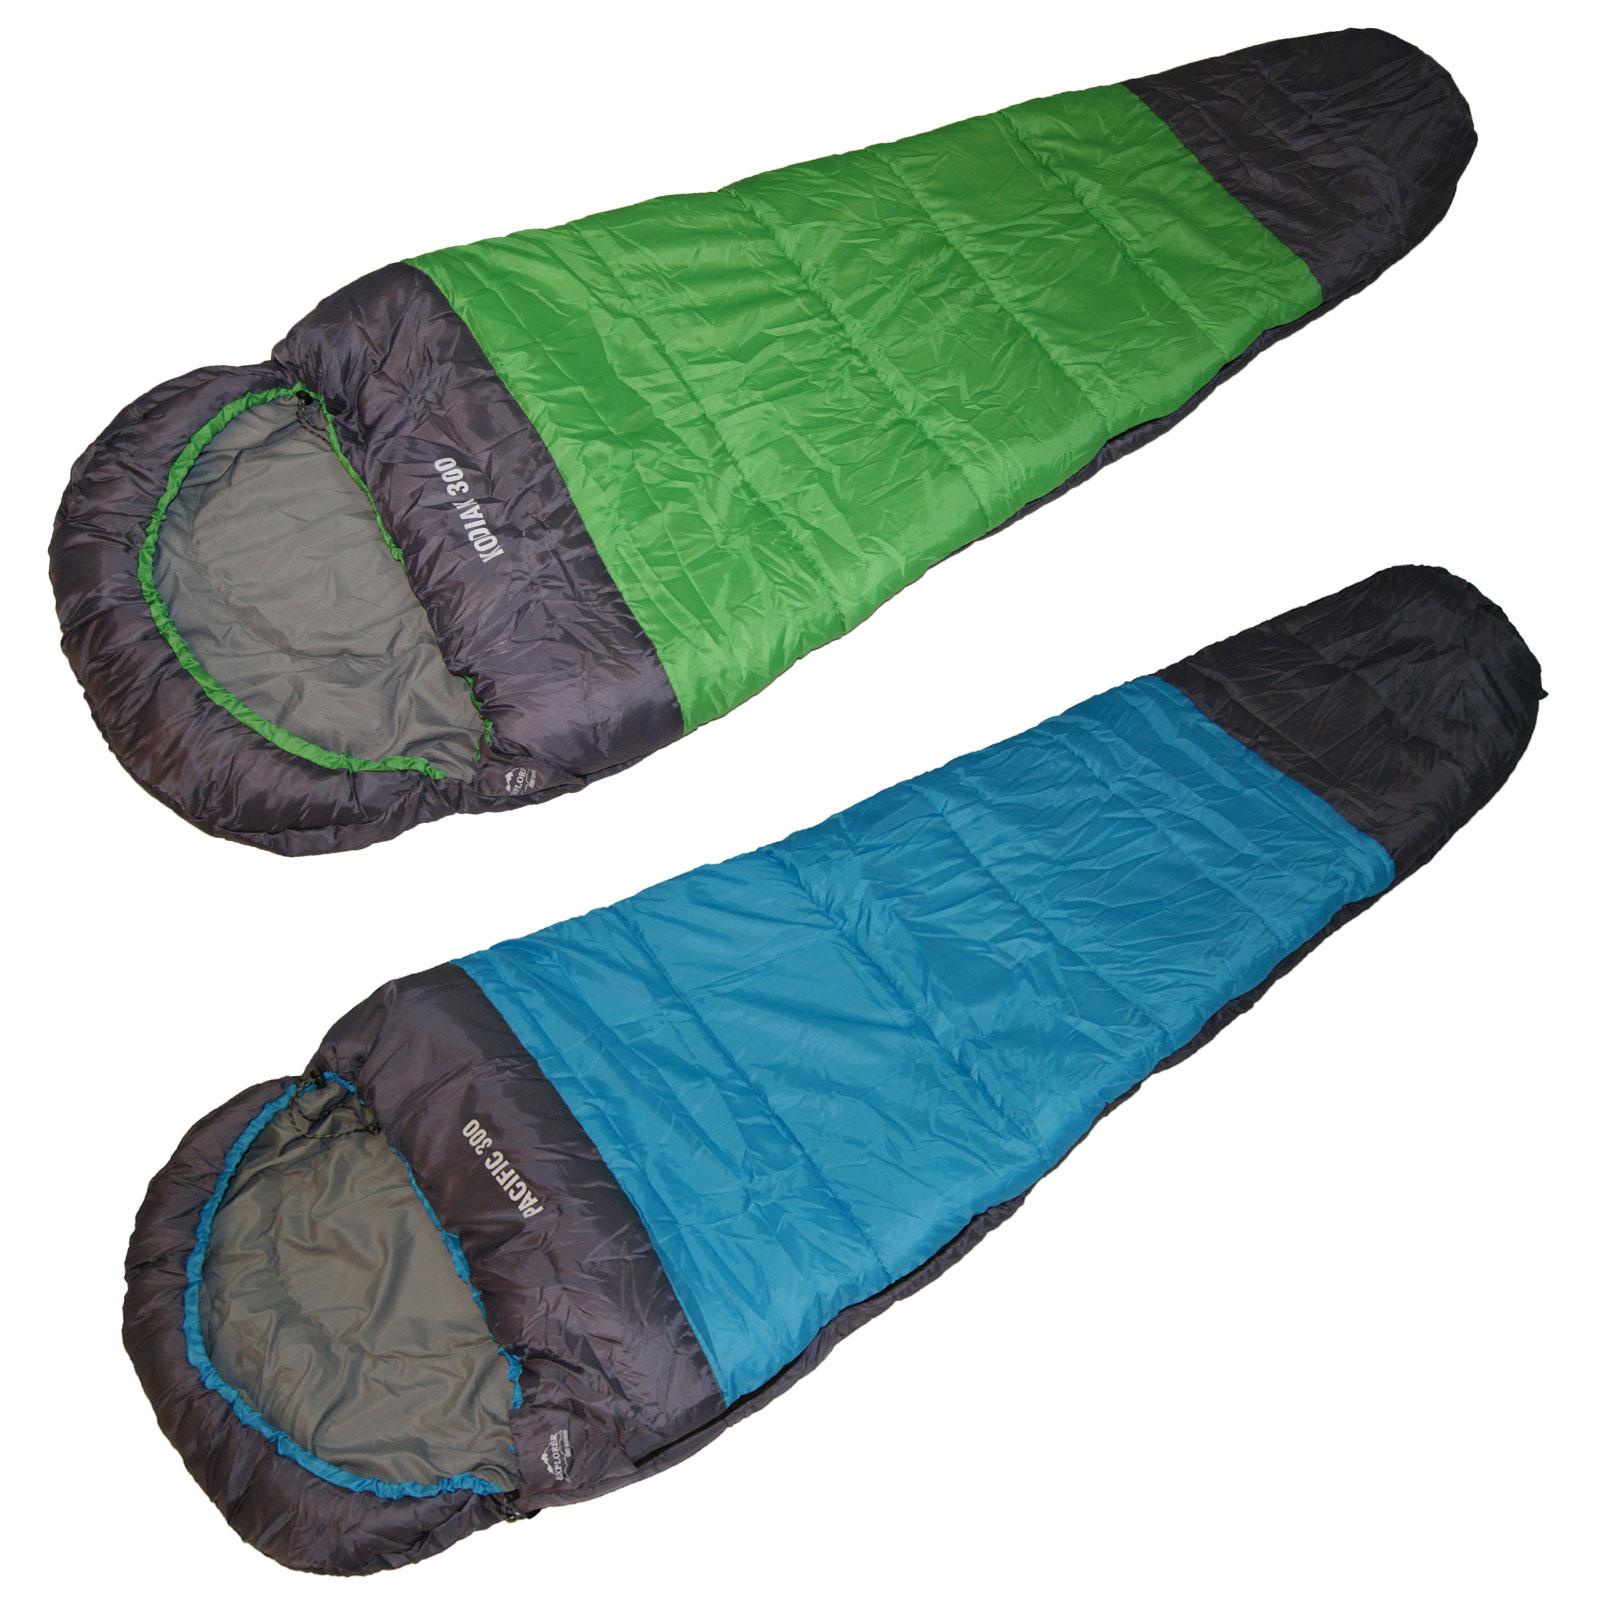 OPEN AIR Isomatte 6mm EVA Schaum Thermo Camping Matte Sport Boden Yogamatte 140g